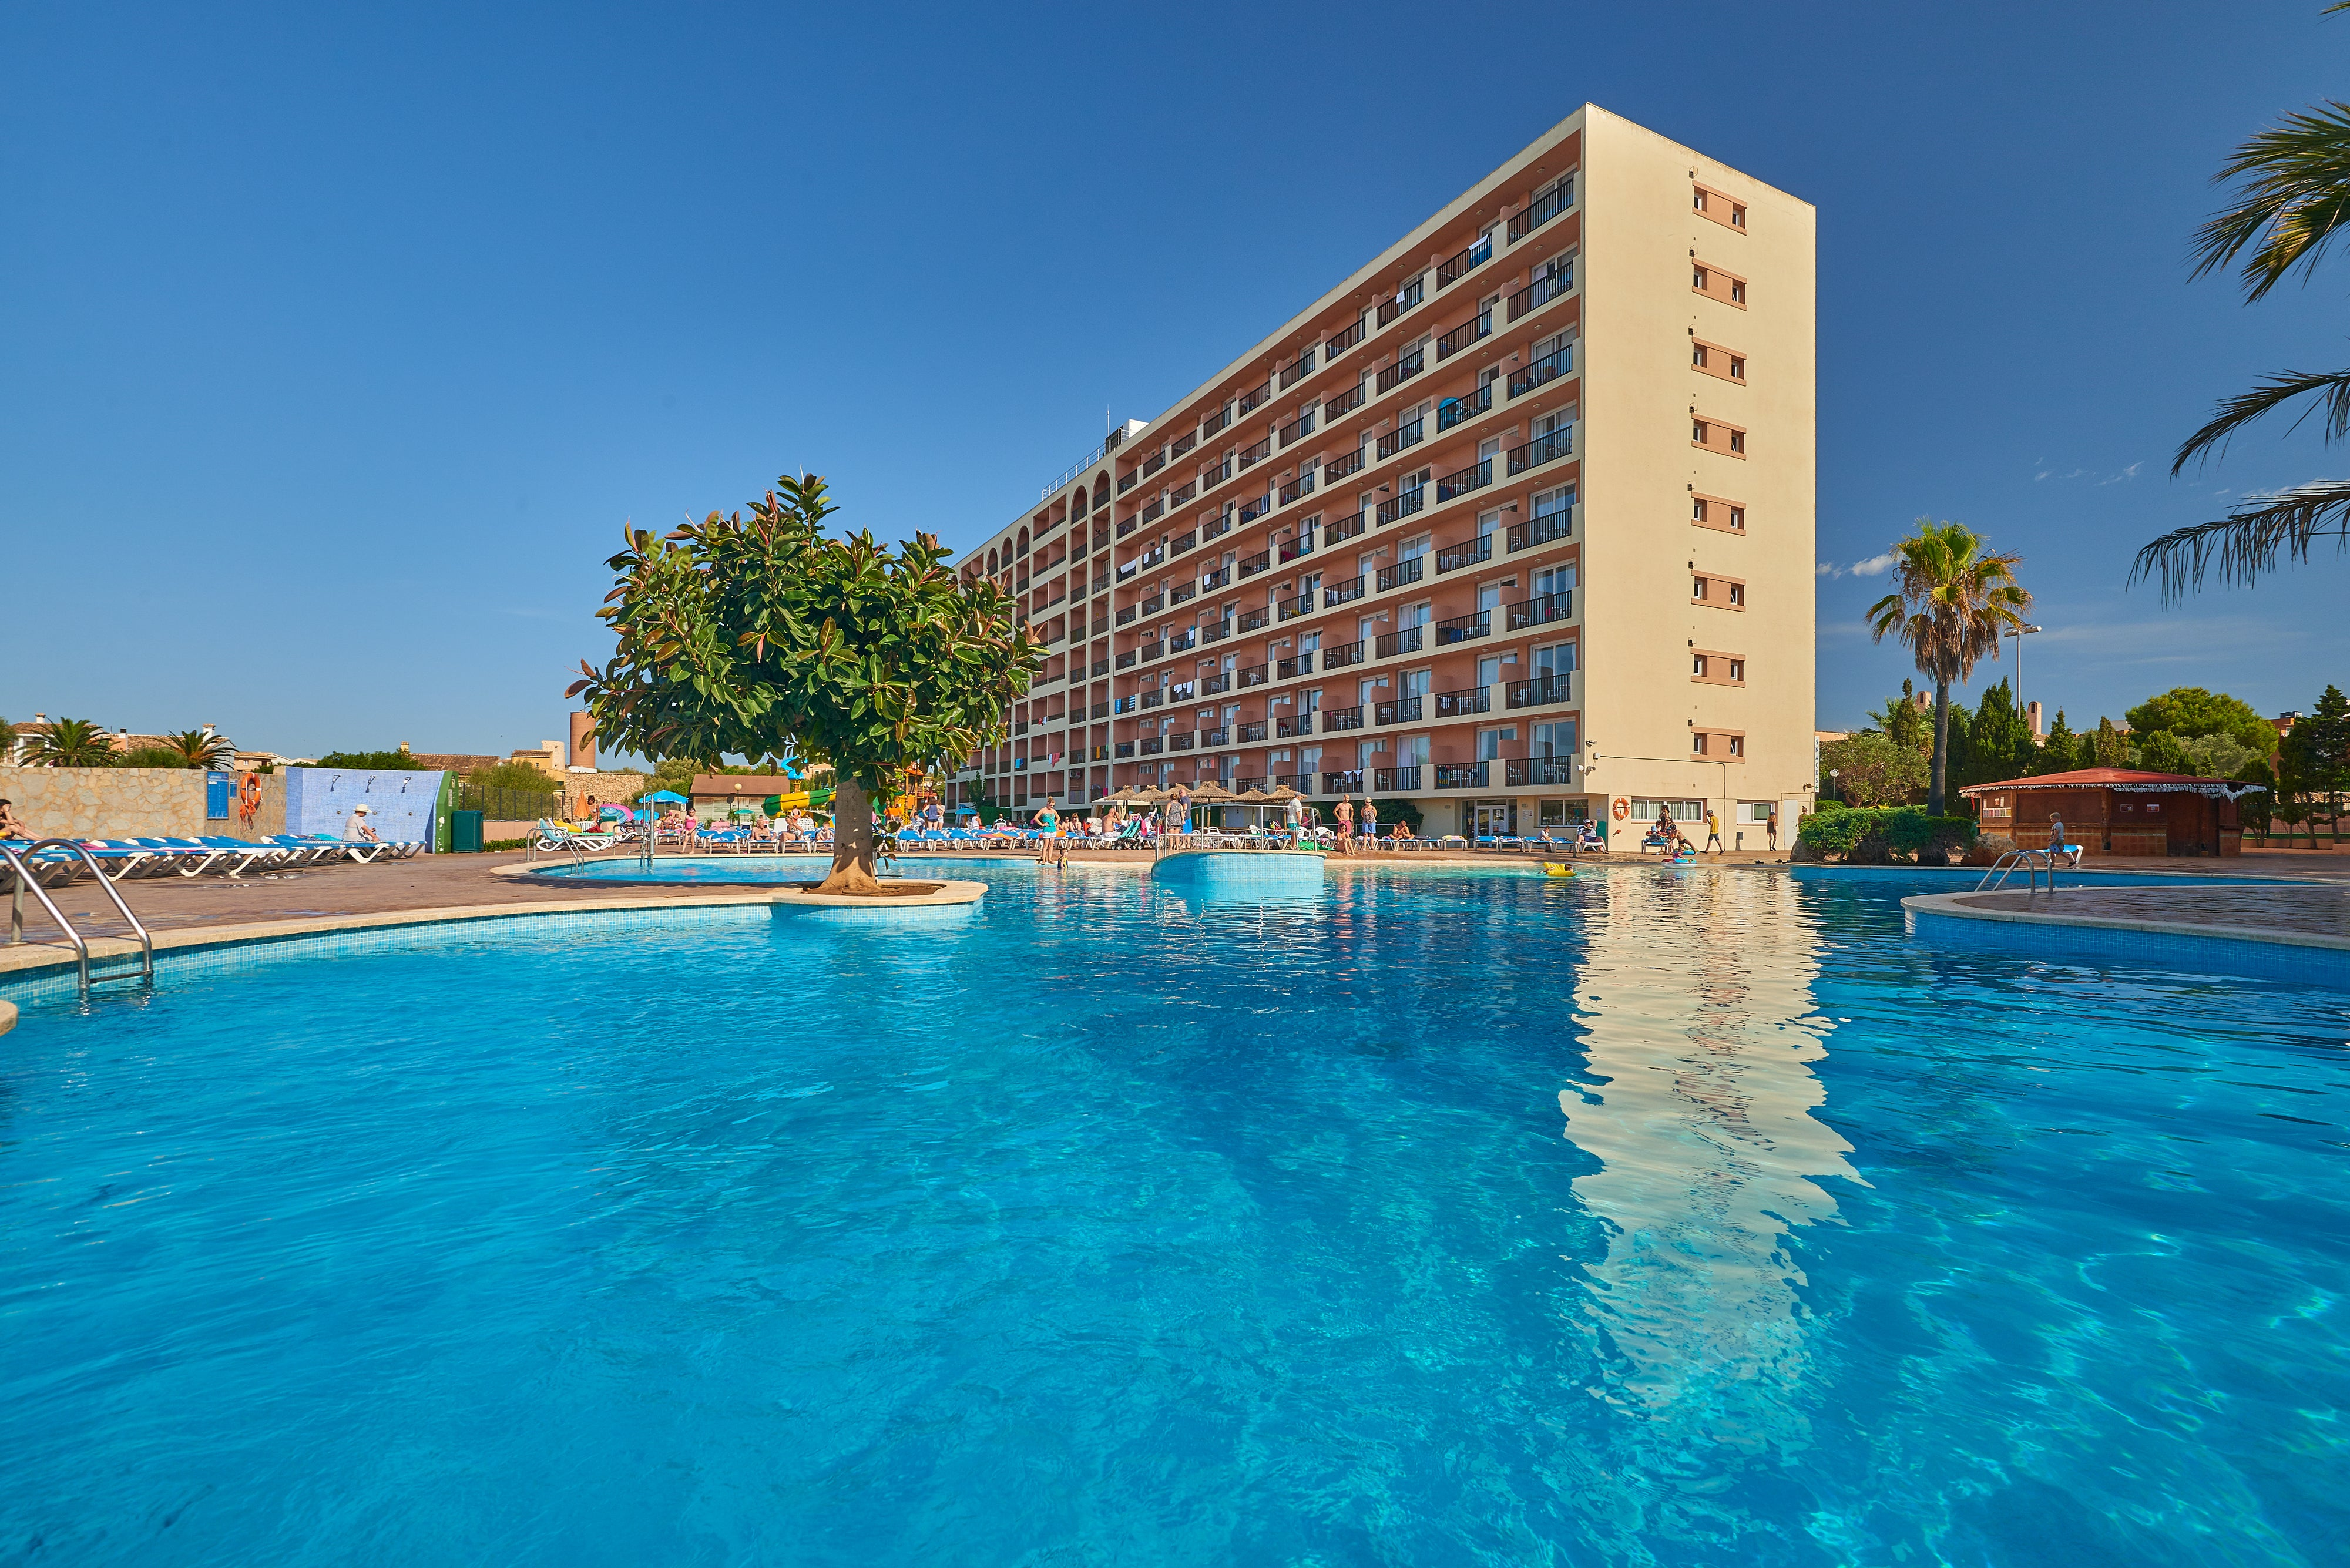 HYB Eurocalas by Garden Hotels